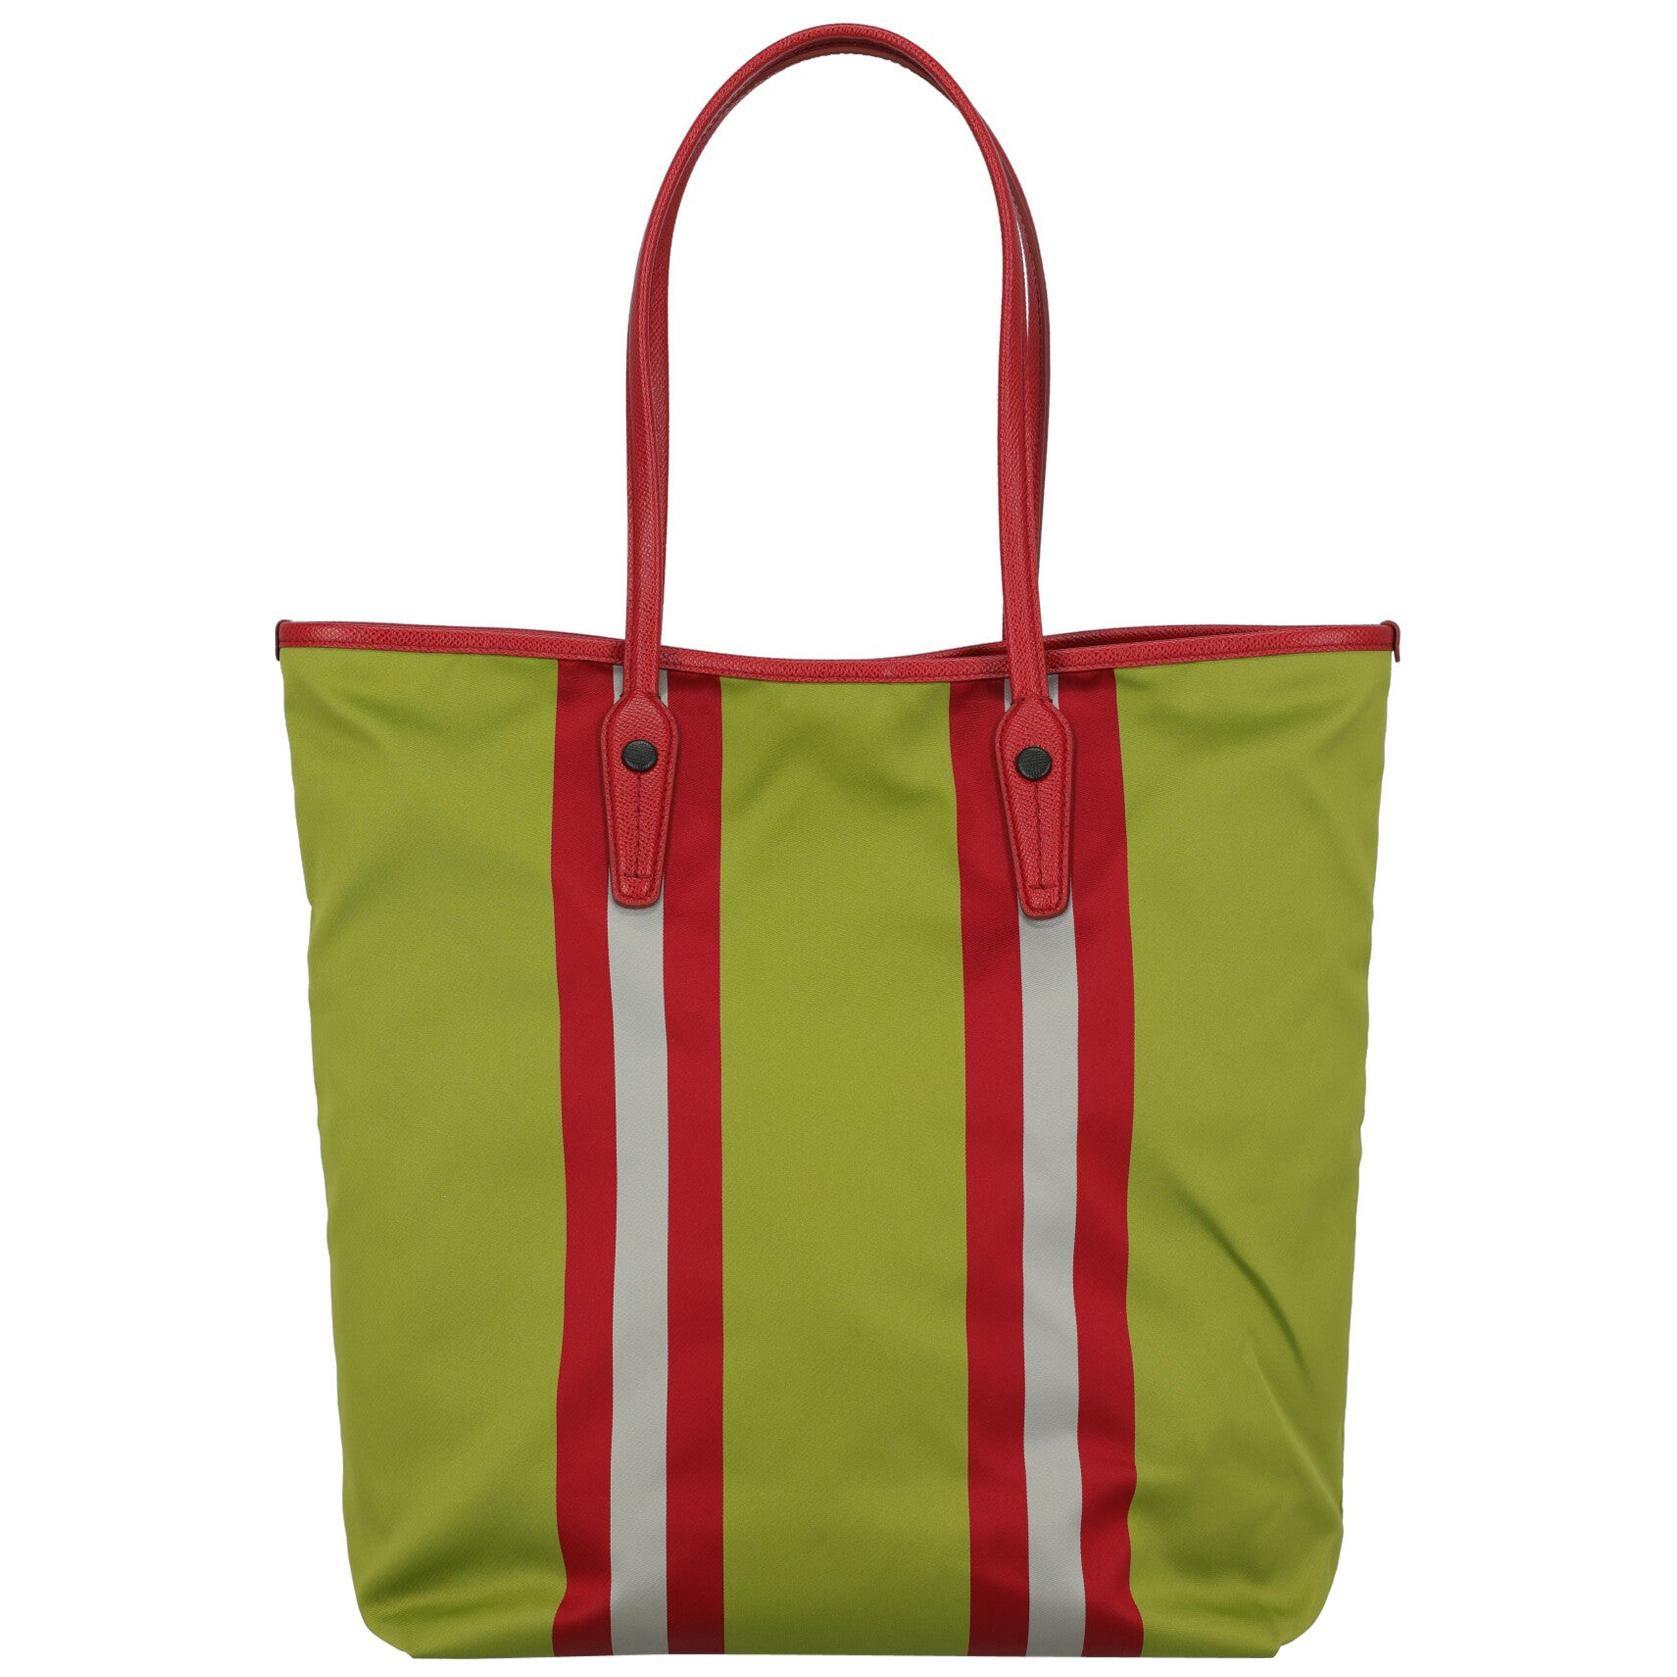 Bally Woman Handbag  Green Synthetic Fibers